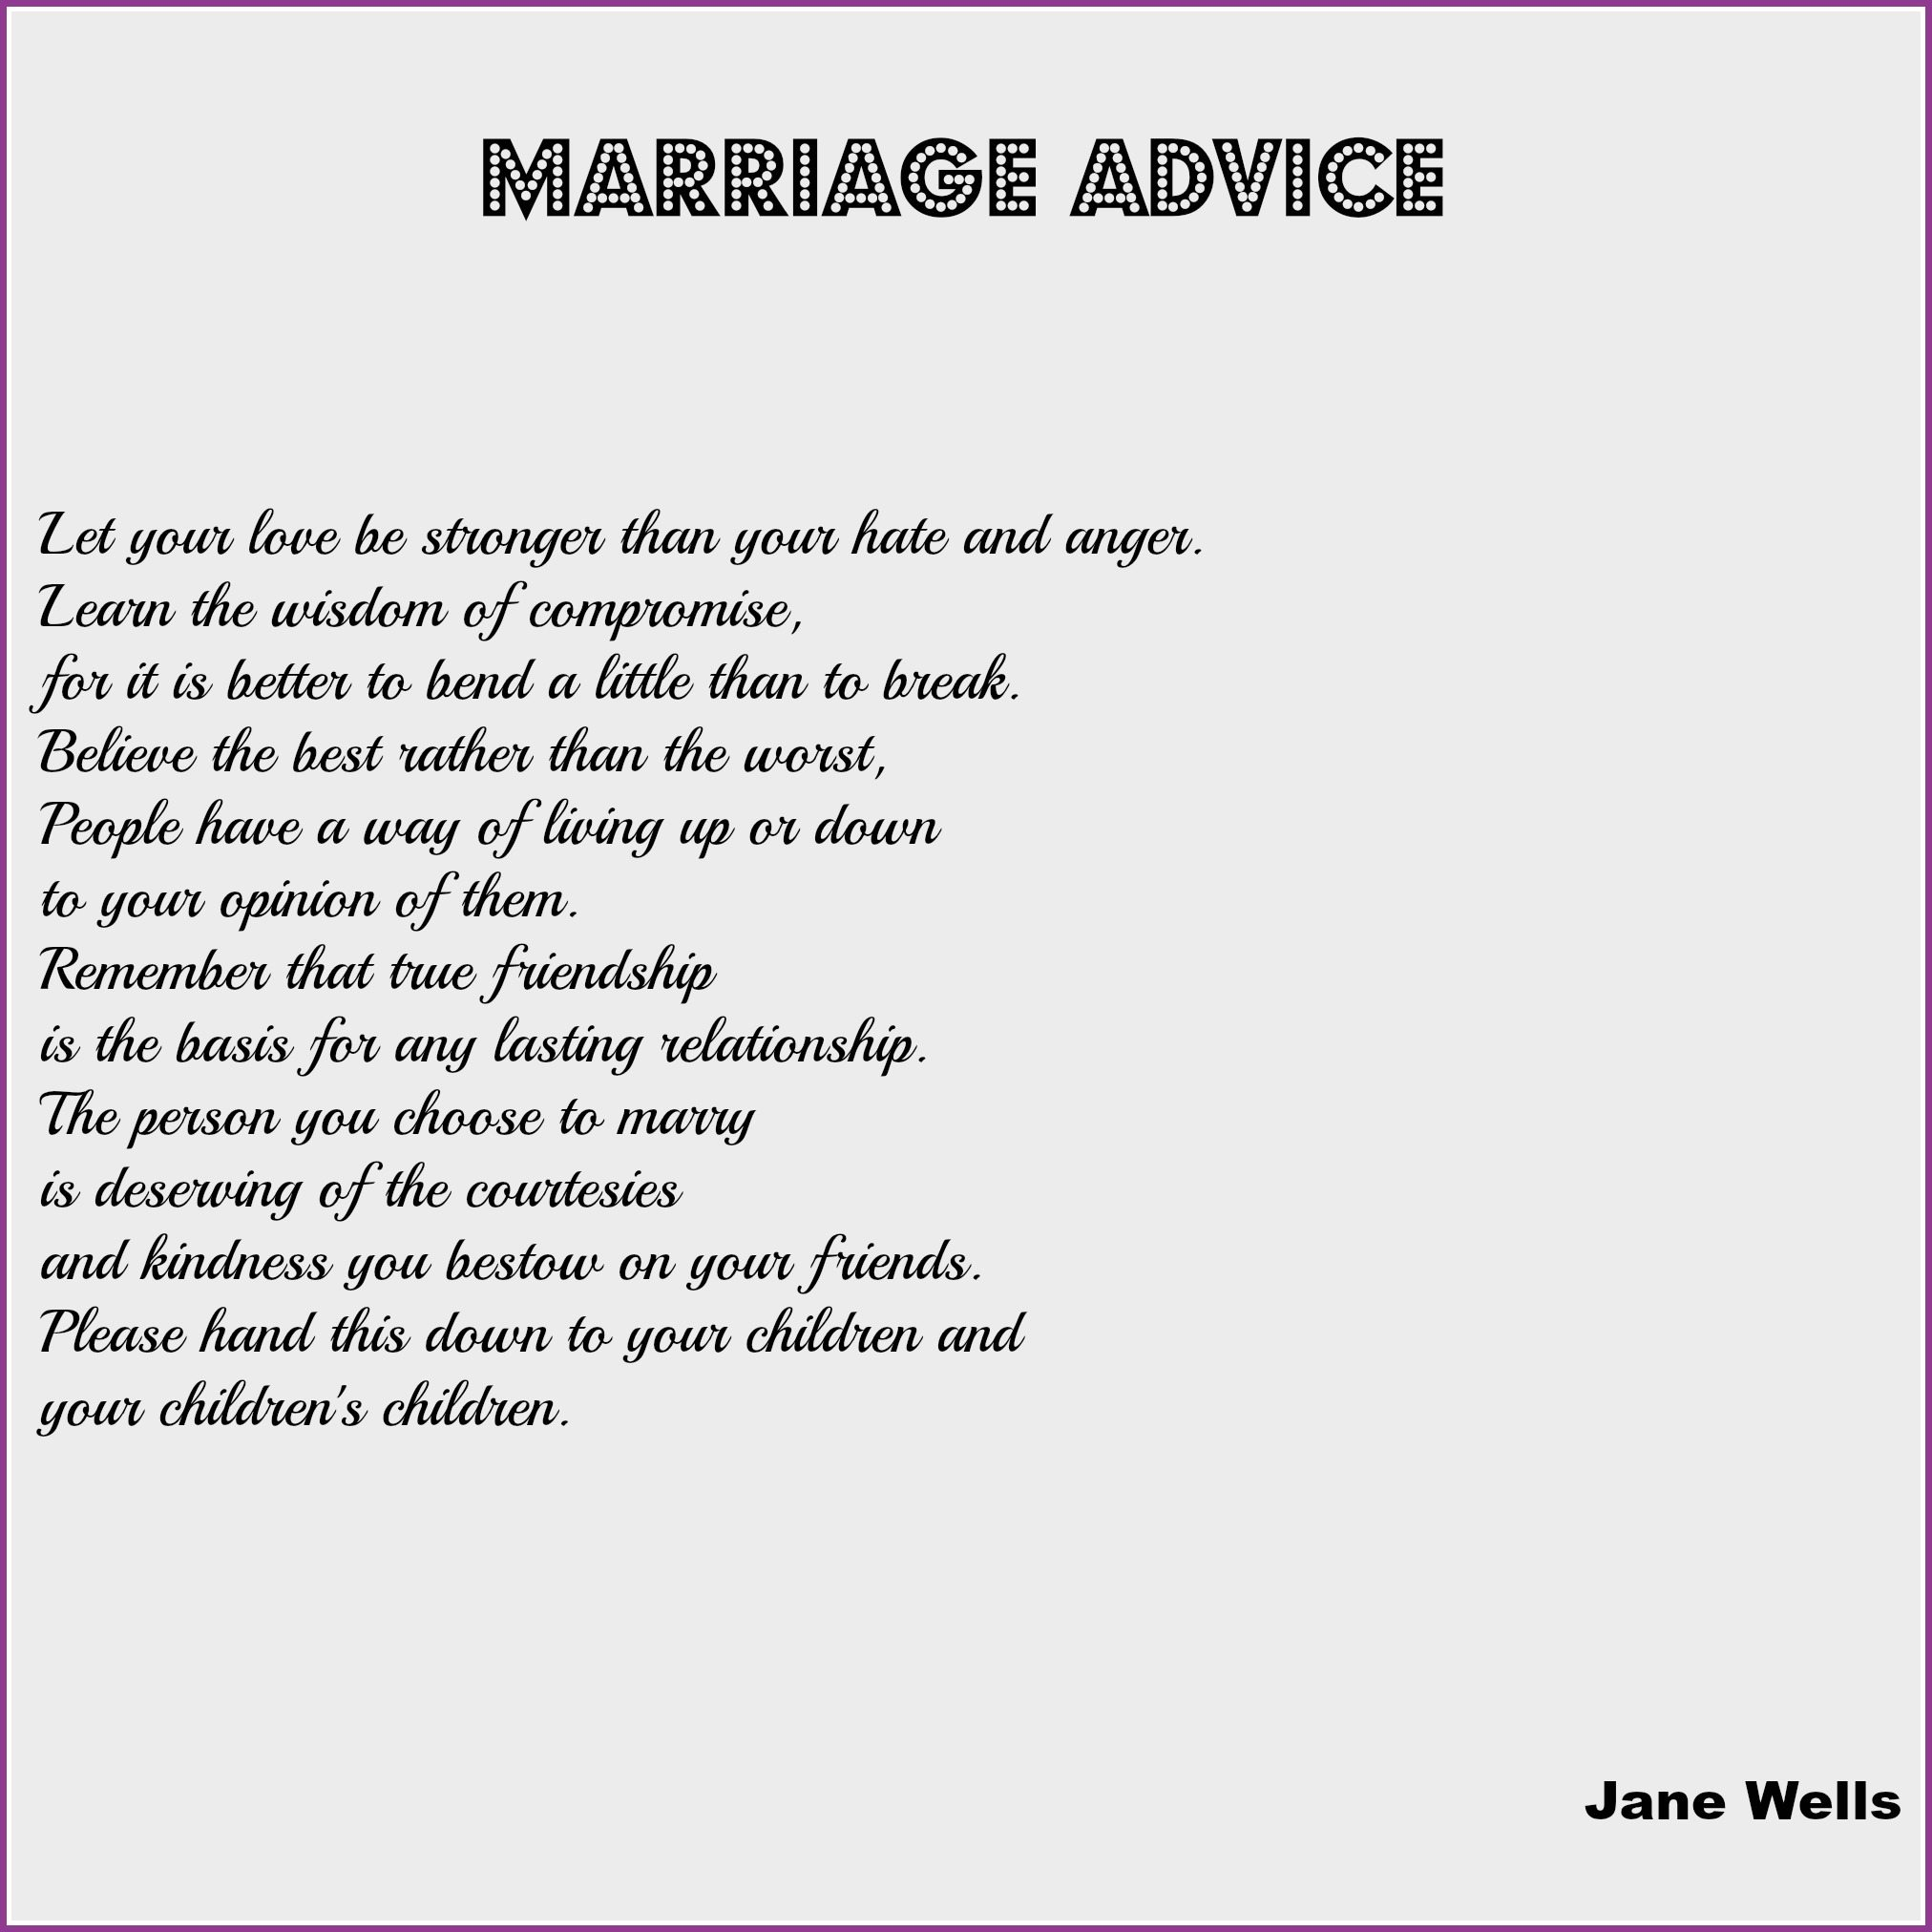 Wedding Reading: Marriage Advice